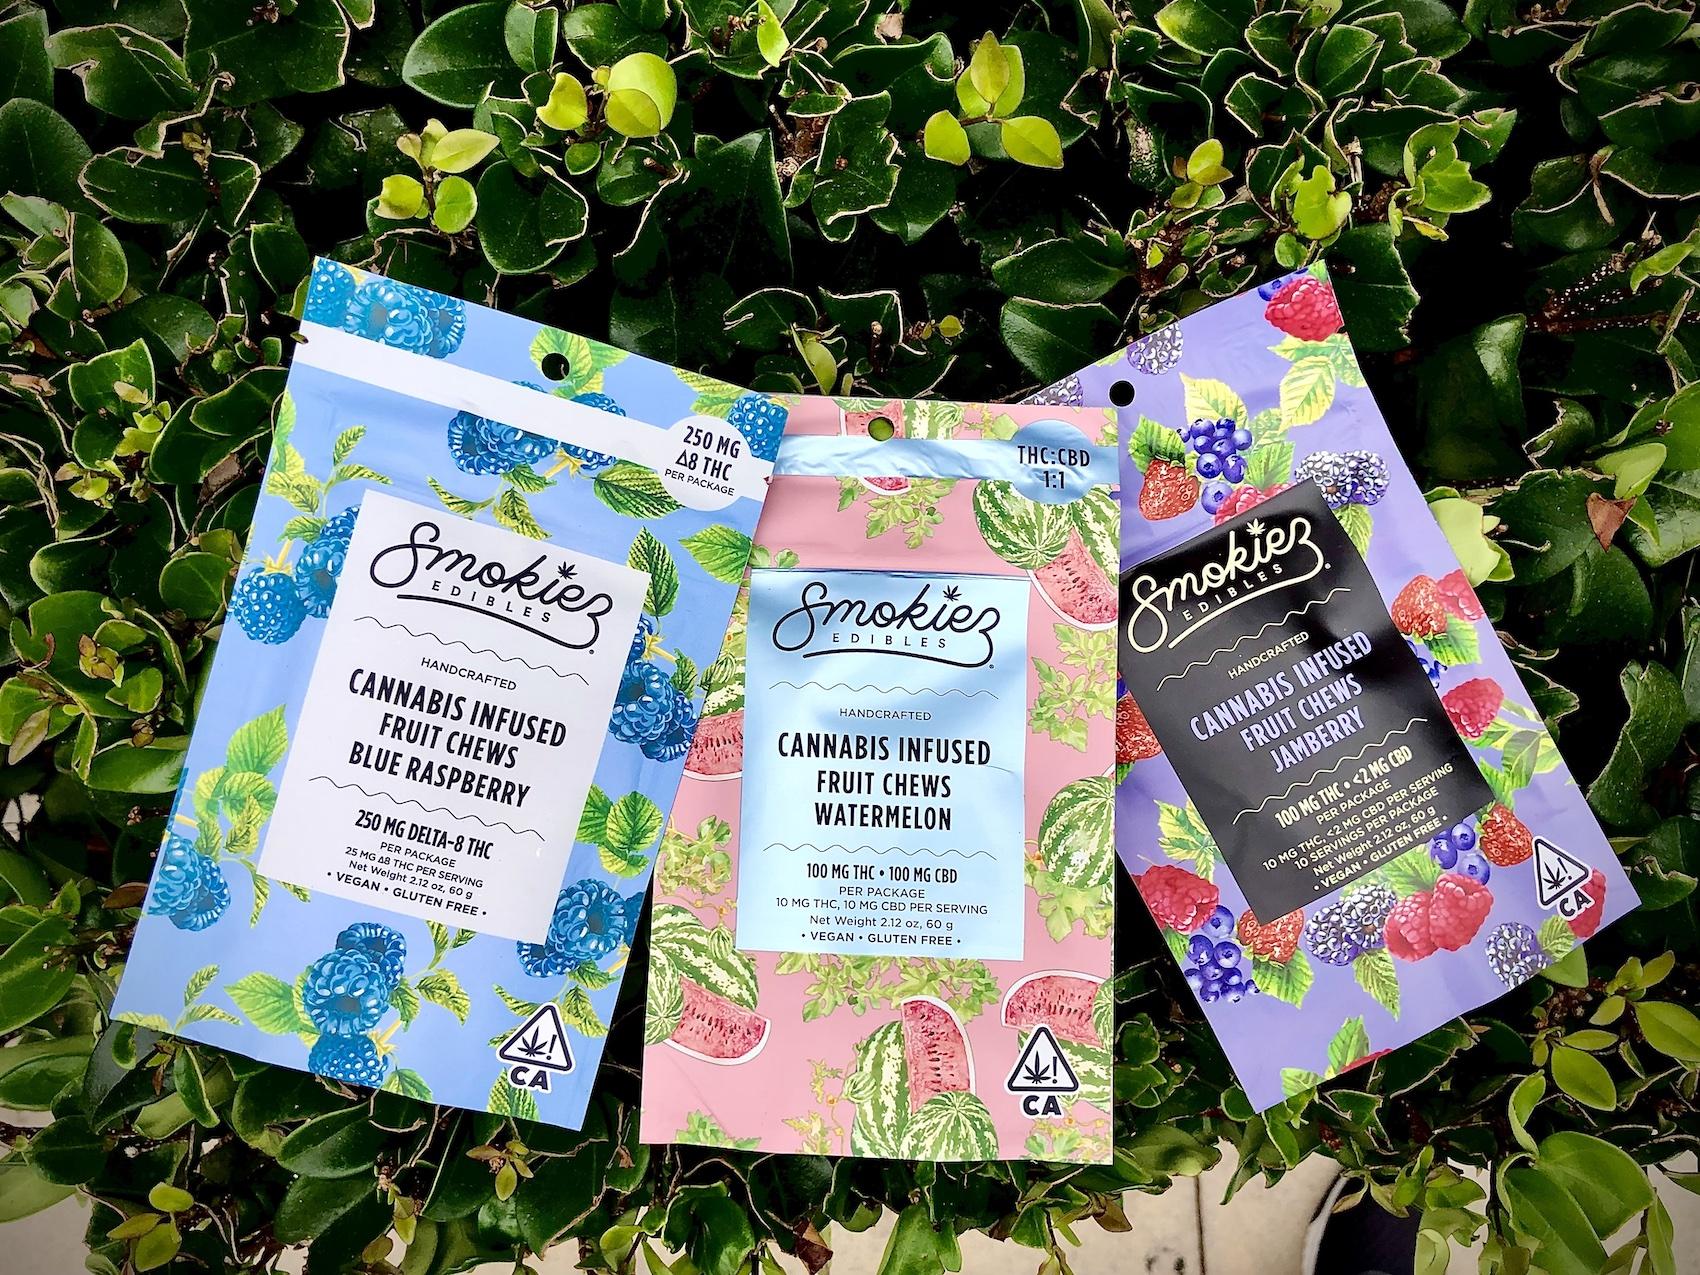 Smokiez Edibles cannabis infused gummies